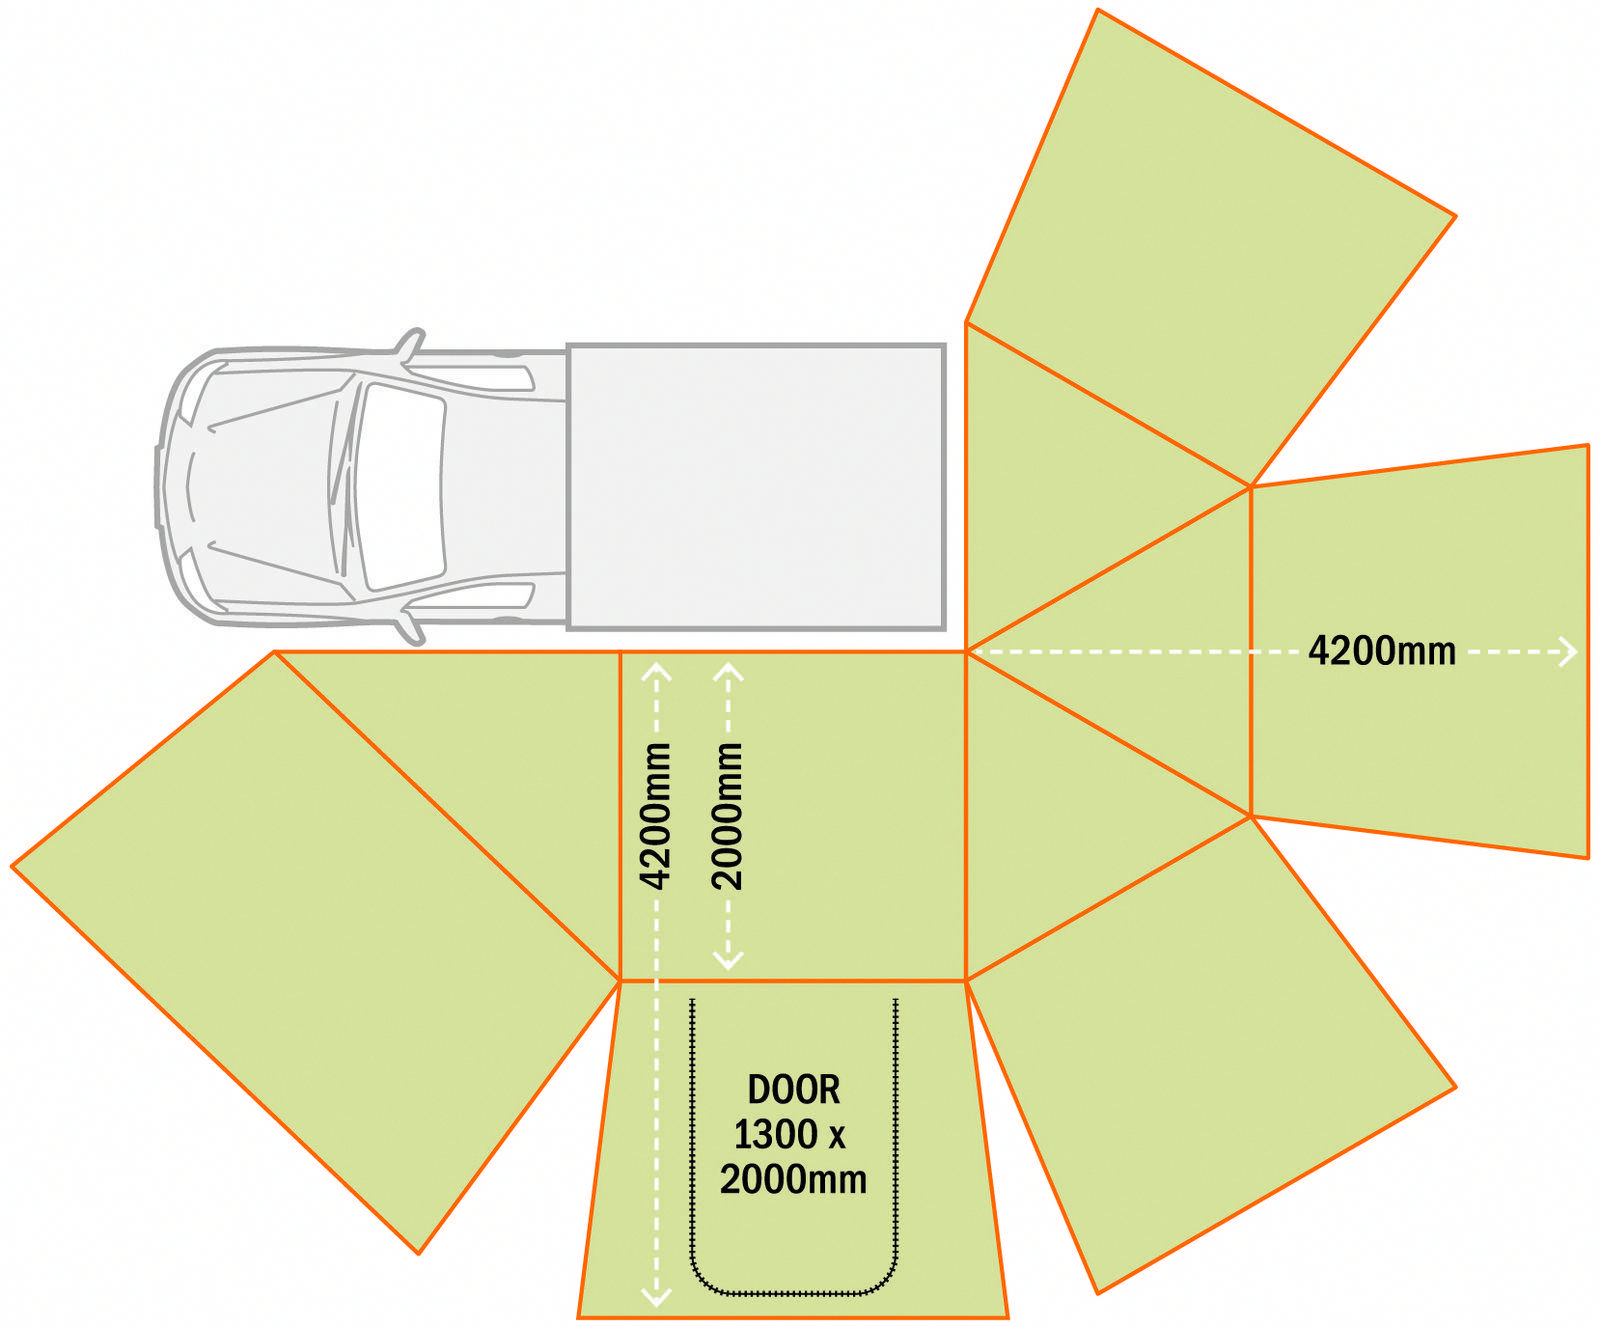 Rhino Rack Sunseeker Awning Roof Rack Mount Bolt On 55 Sq Ft Rhino Rack Car Awning Rr32133 In 2020 Car Awnings Awning Roof Rack